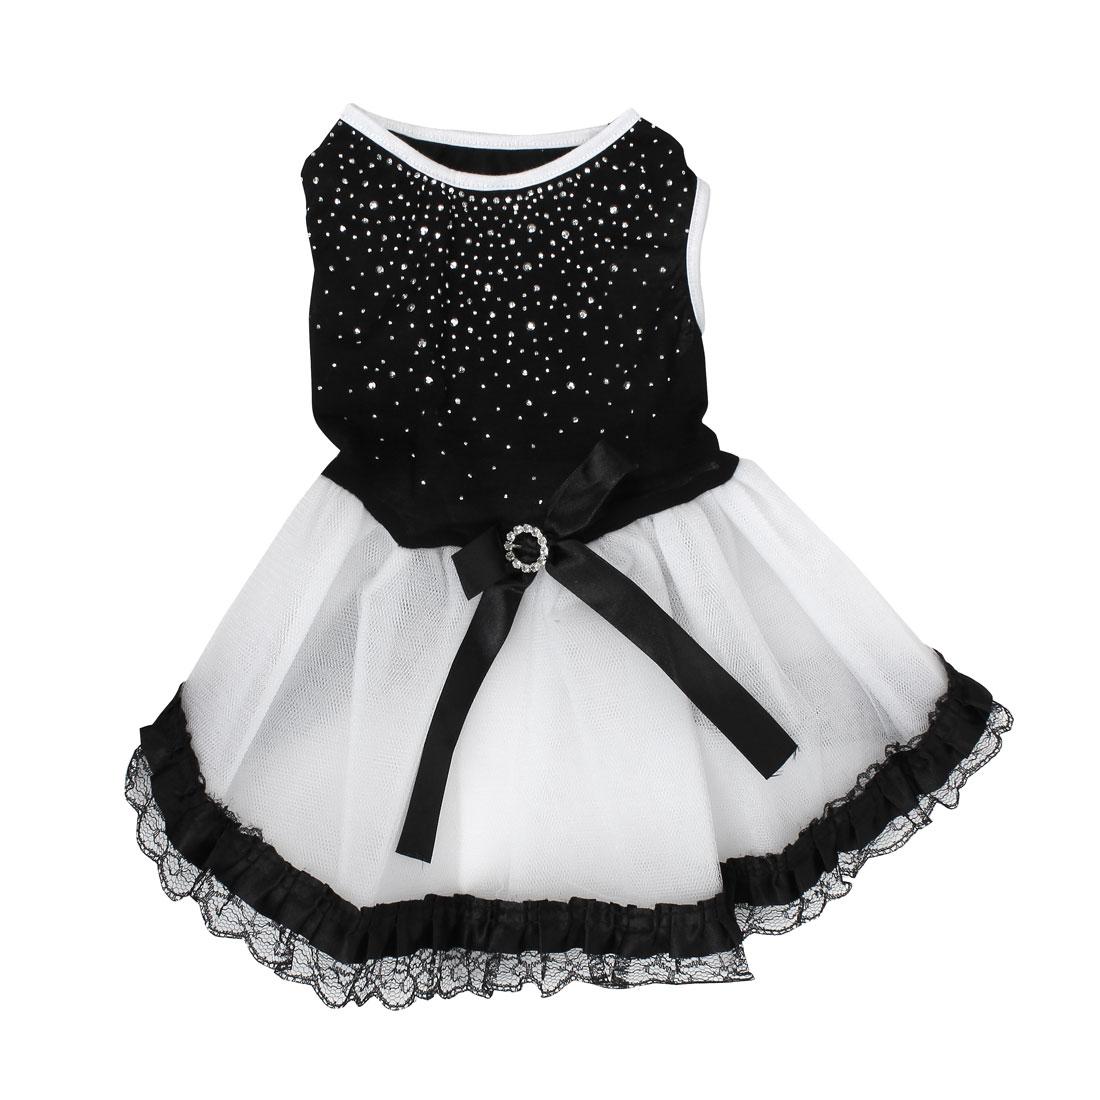 Pet Dog Doggie Rhinestone Inlaid Bowknot Decor Ballet Dress Skirt Black Size XS